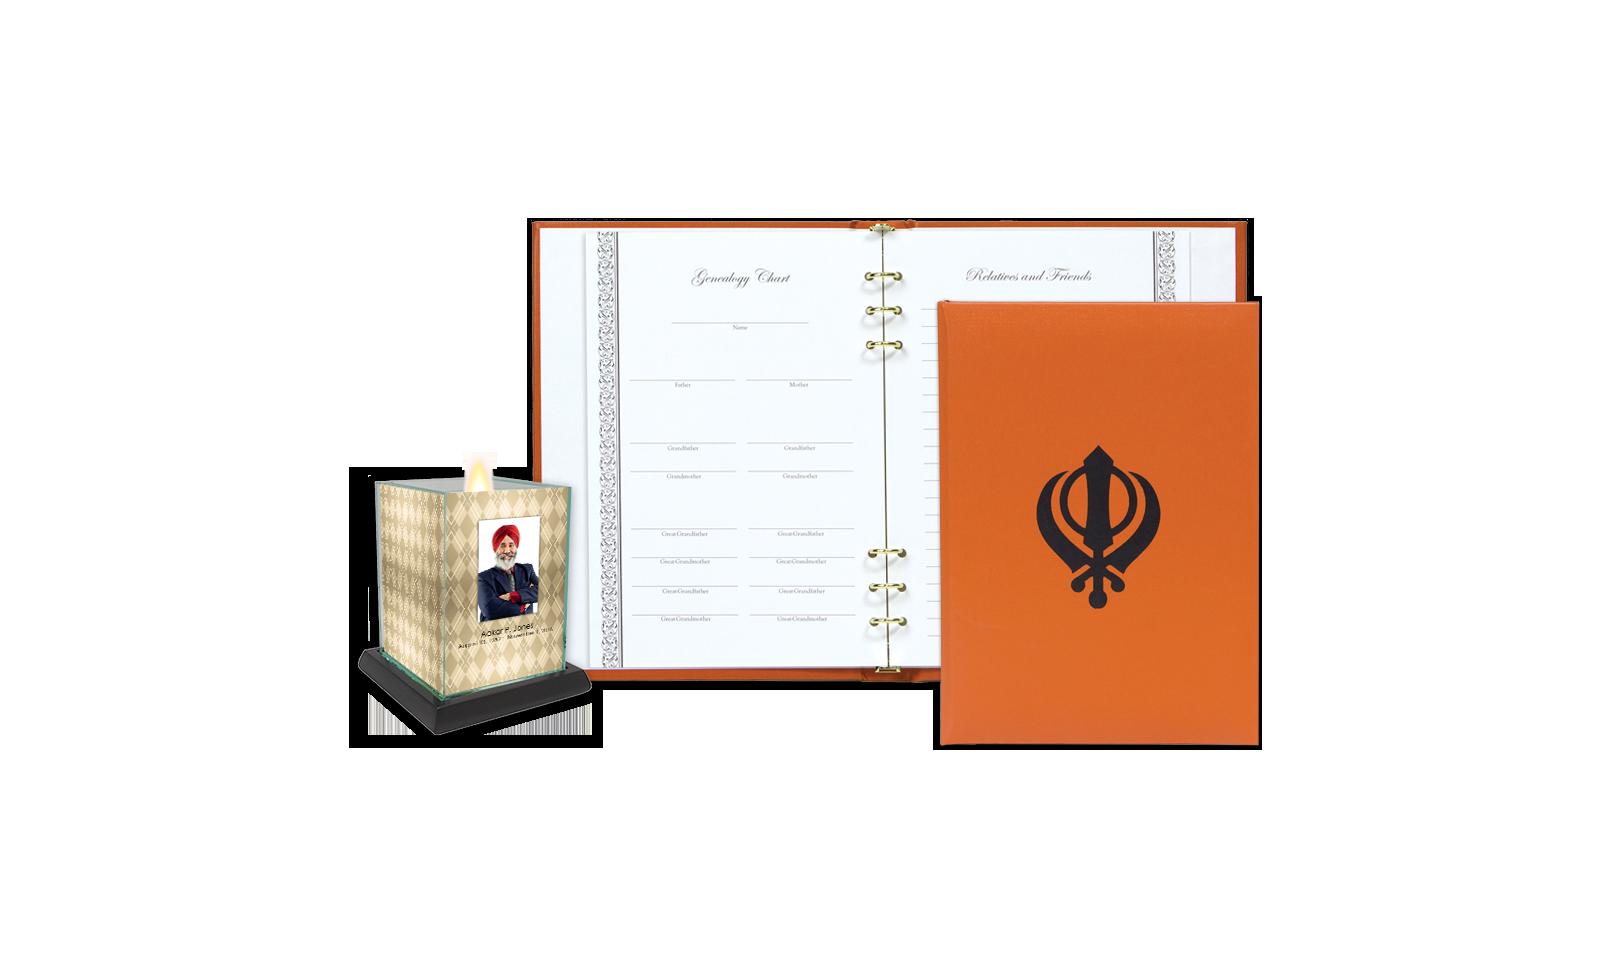 ROL Sikhism Orange Series 445 SIK